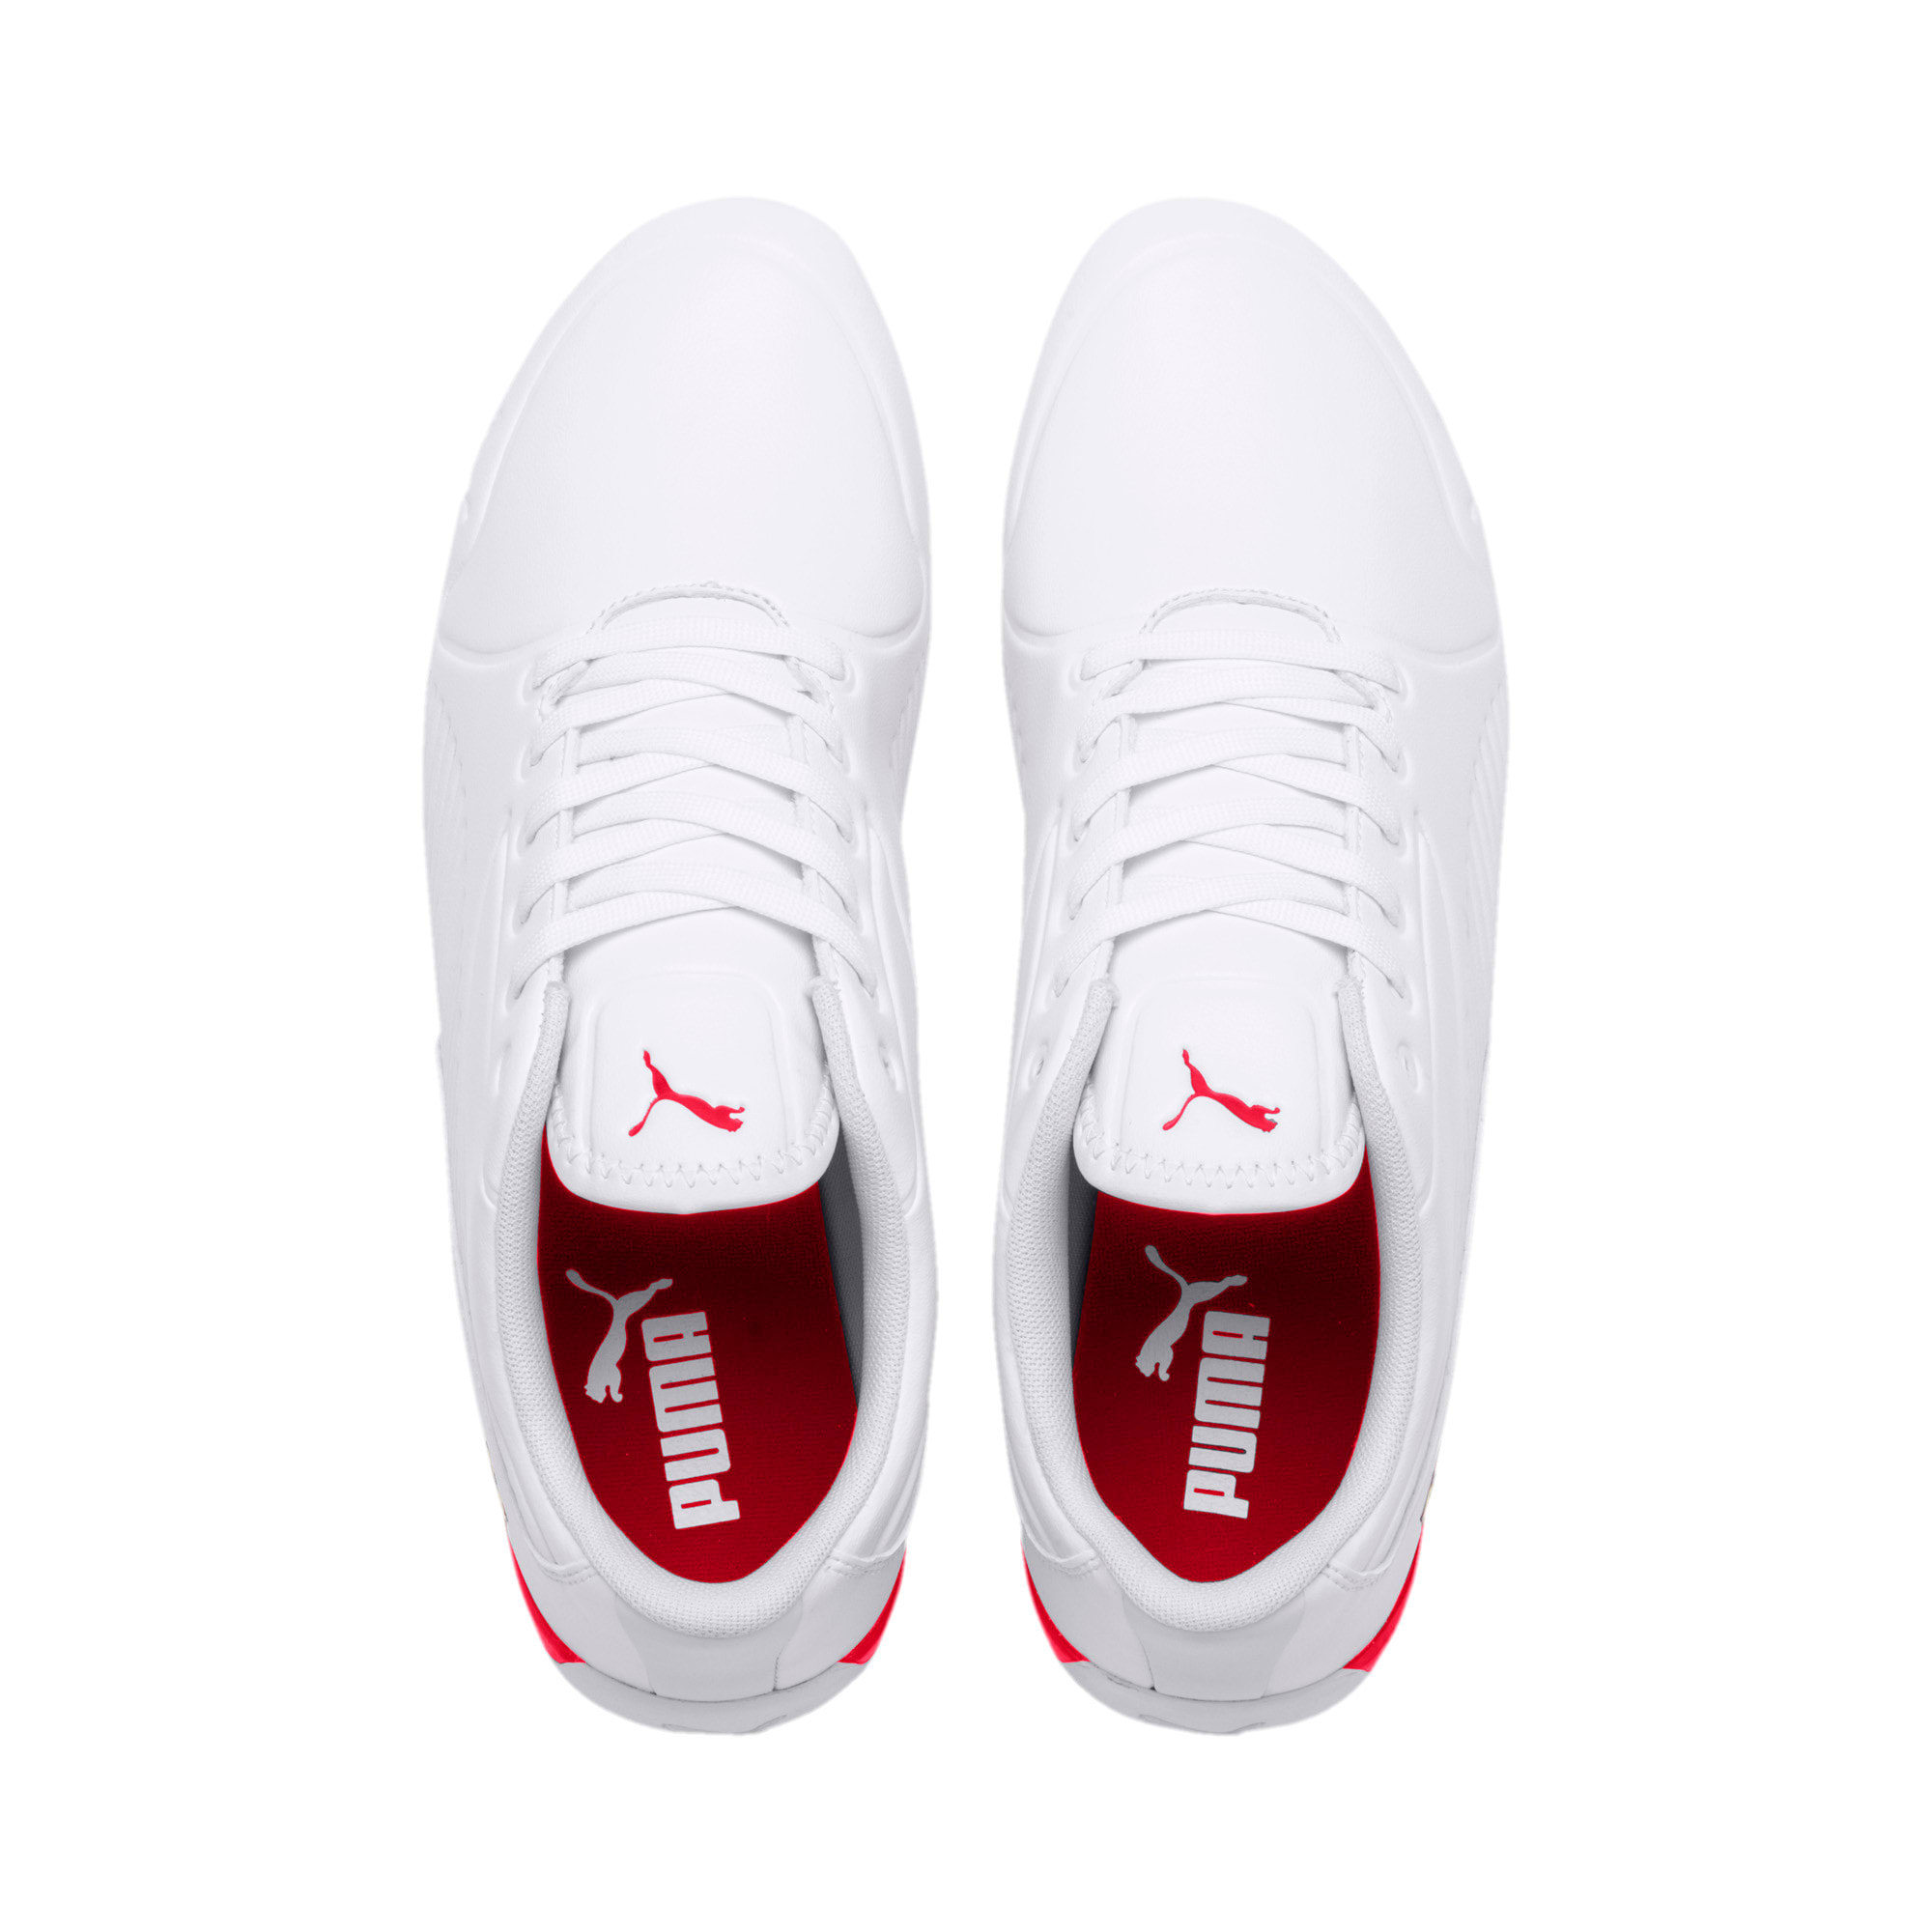 Thumbnail 7 of Scuderia Ferrari Drift Cat 7S Ultra Men's Shoes, Puma White-Rosso Corsa, medium